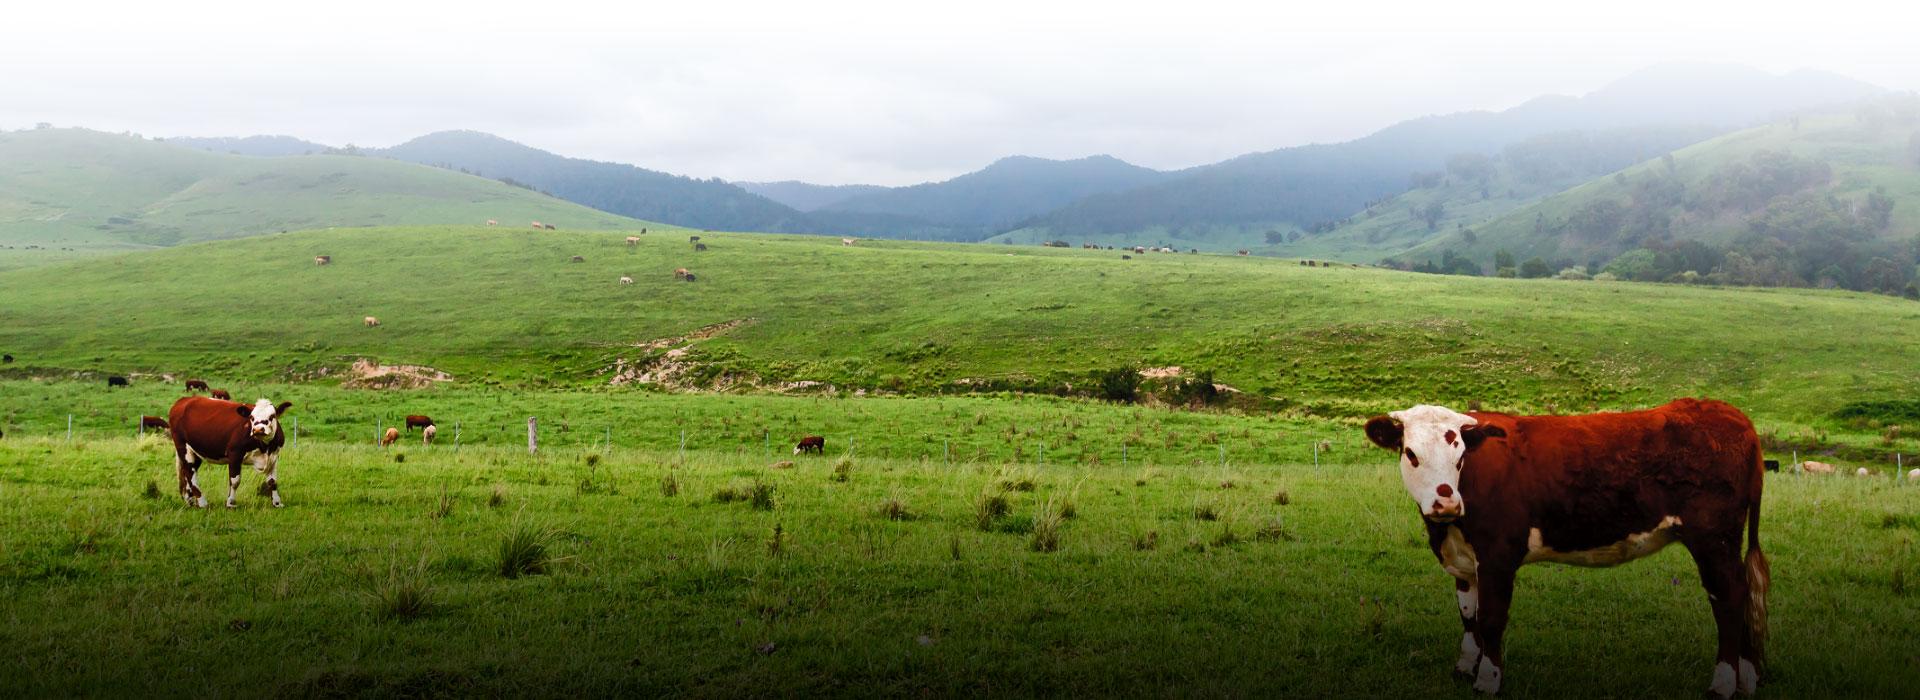 Cattle standing in lush paddocks